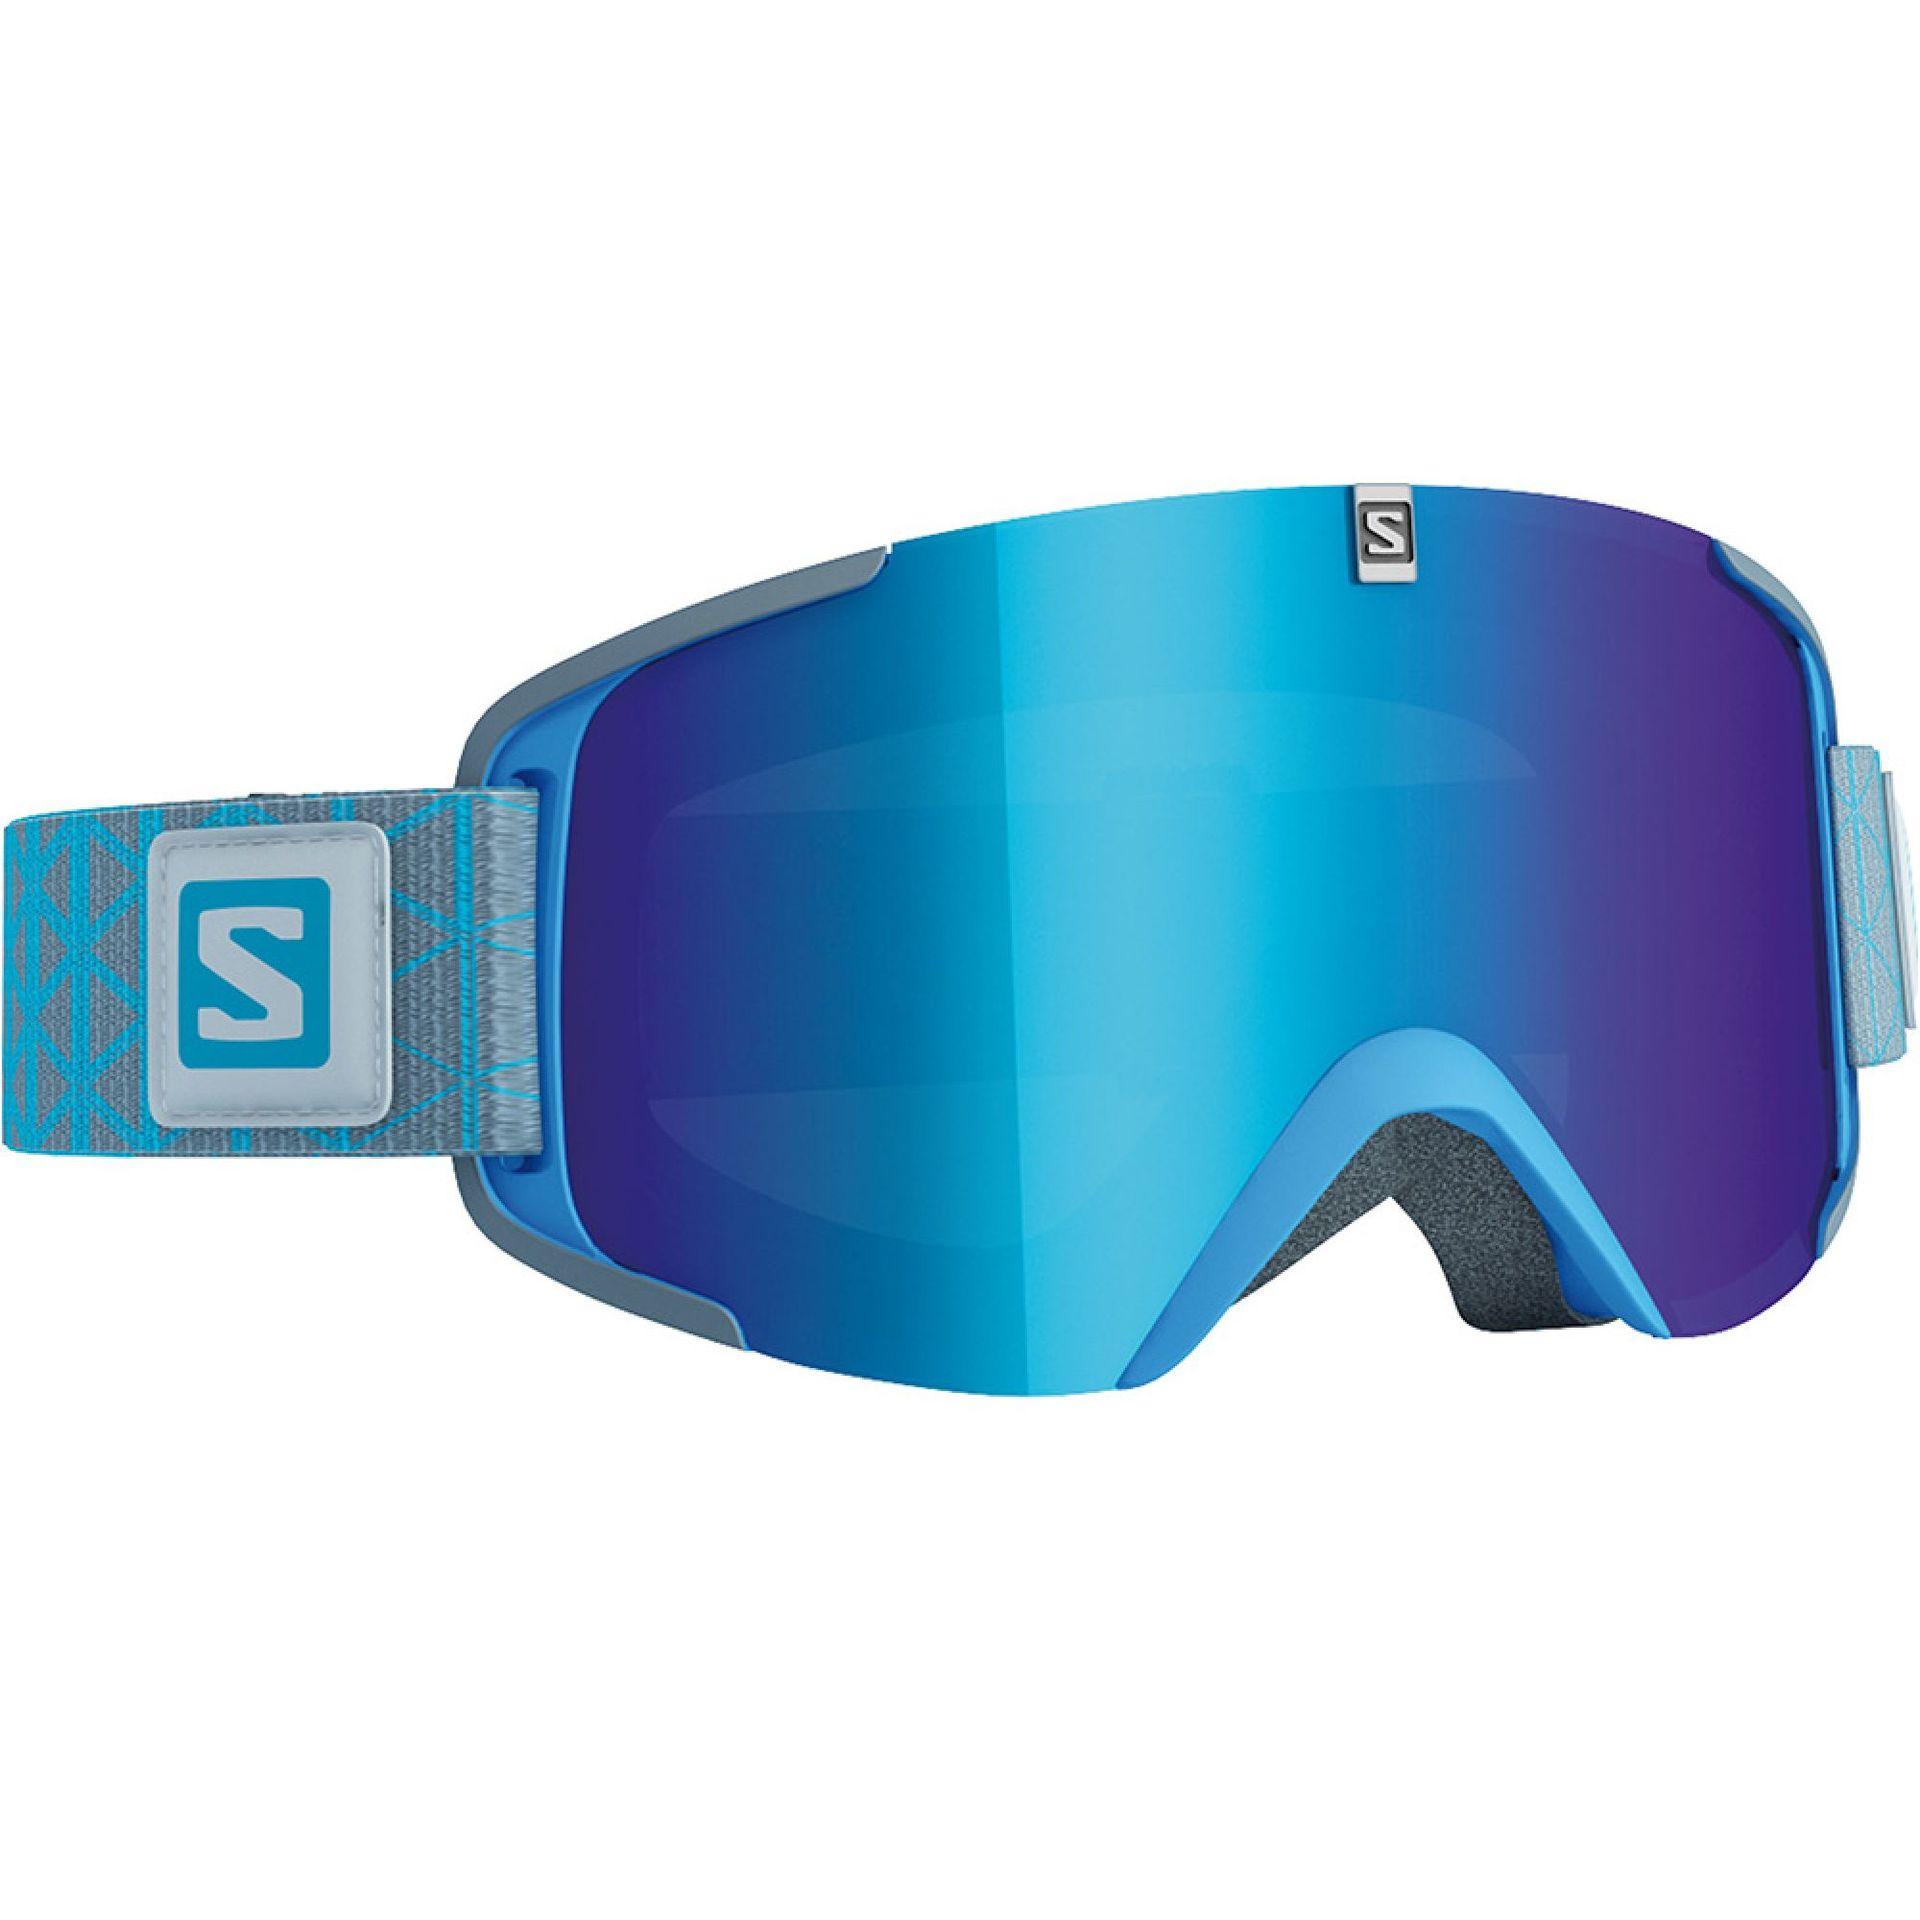 GOGLE SALOMON X VIEW EXTRA BLUE SOLAR BLUE 0